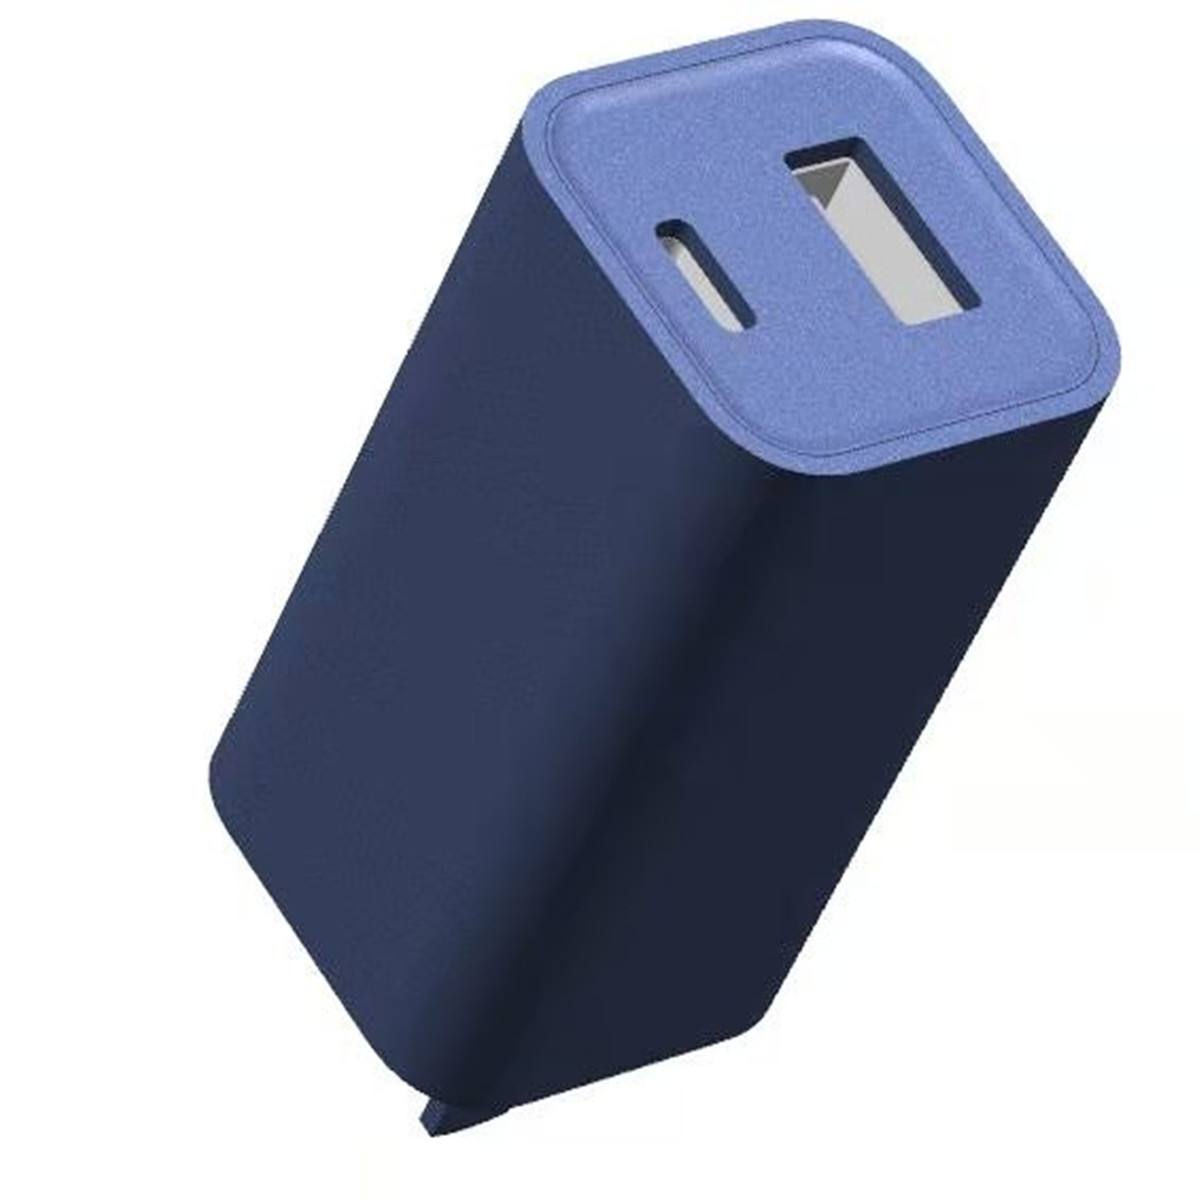 Mini flat transformer 65W charger for Apple OPP0, Huawei Xiaomi notebook adapter